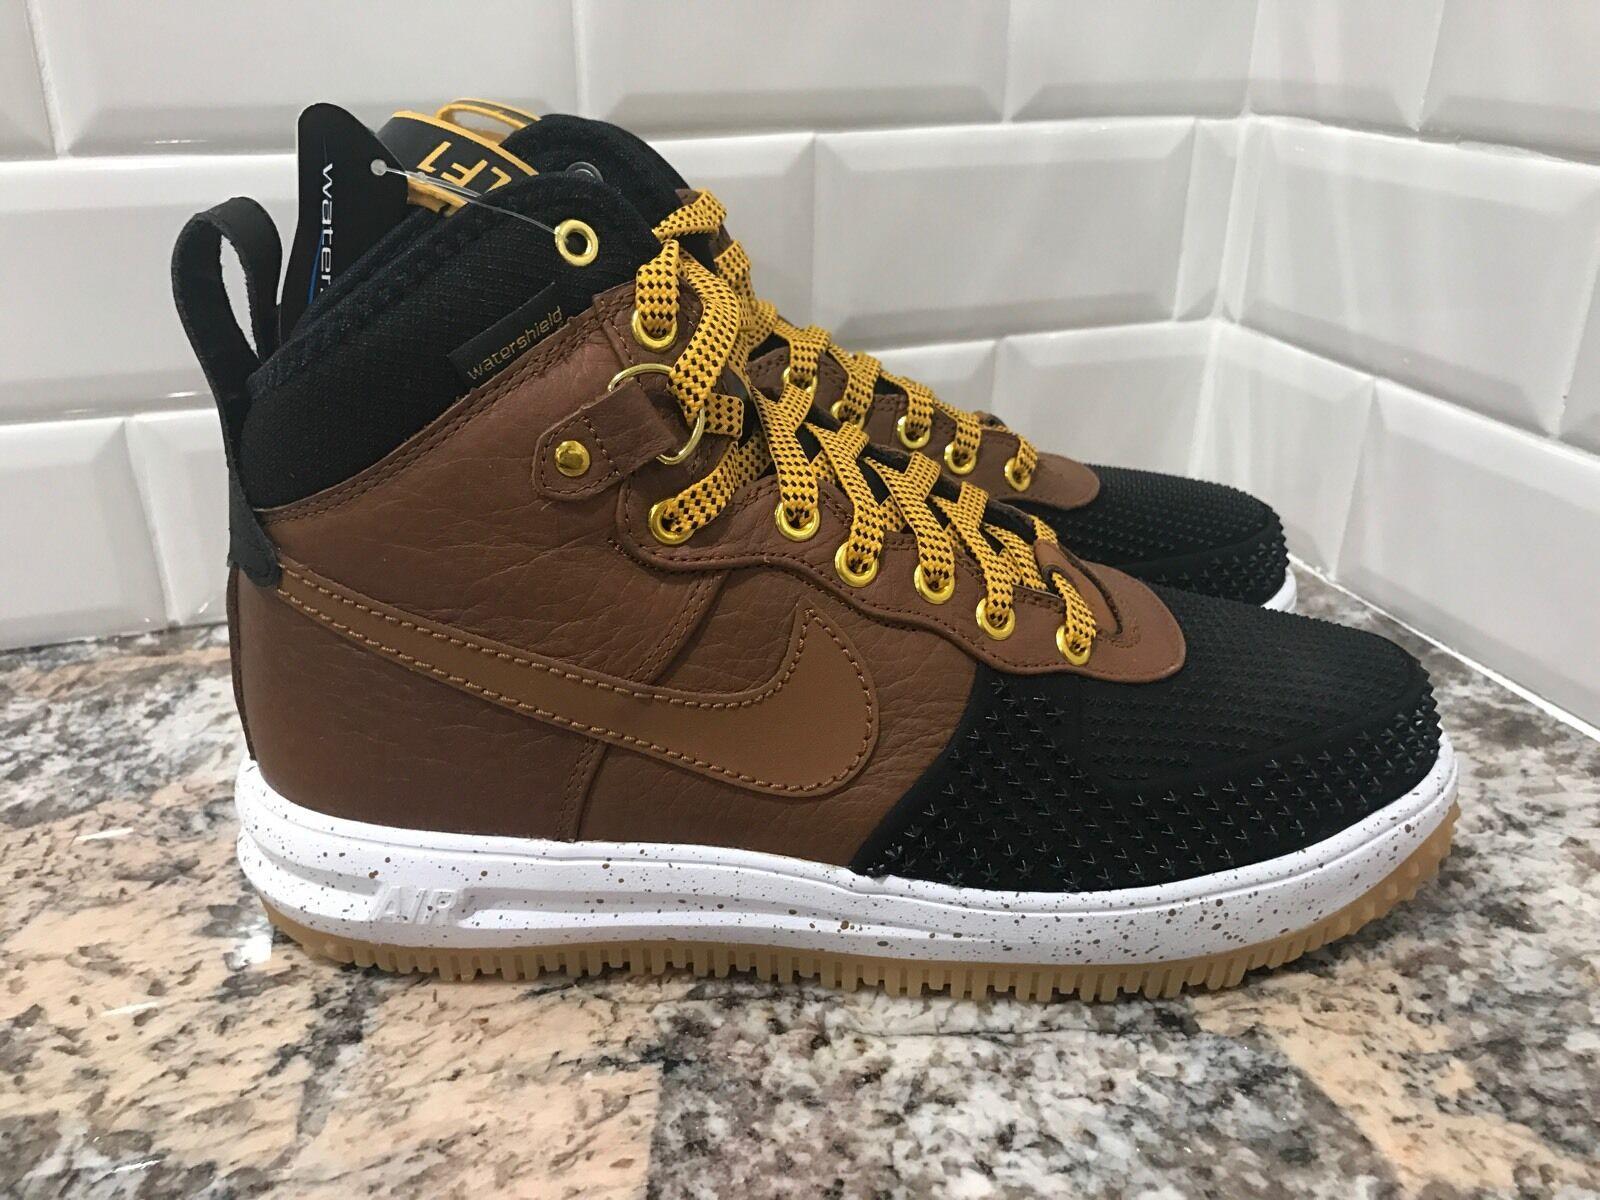 Nike Nike Nike Lunar Air Force One 1 Duckboot Gold Gum Tan Black Men's SZ 7.5 805899-004 65b45e